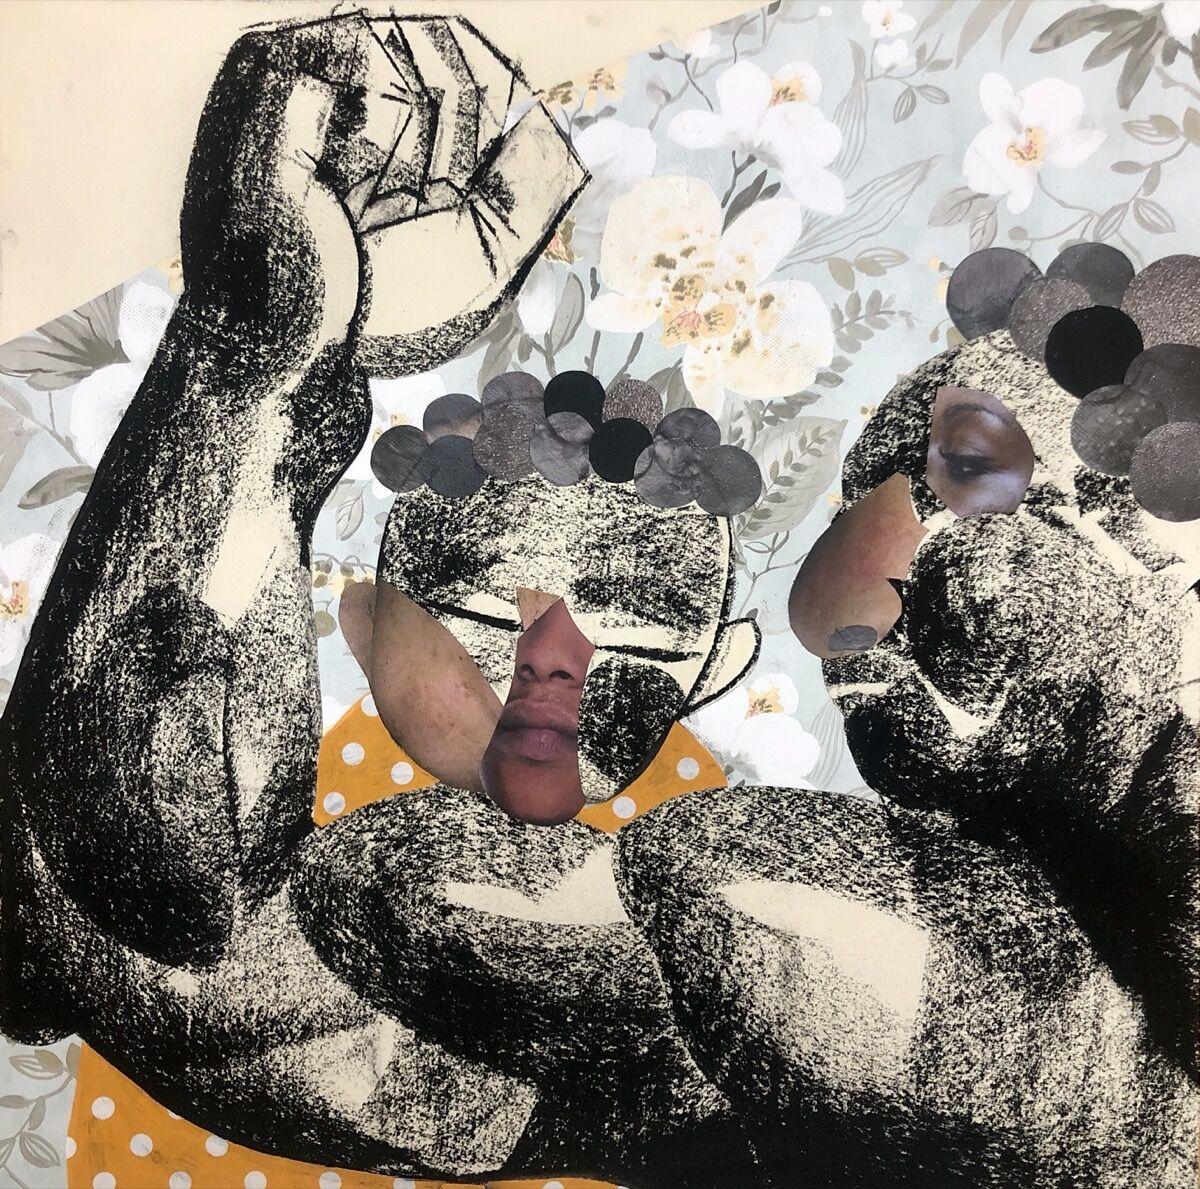 Clotilde Jiménez, The Family Tradition, 2020. Courtesy of the artist and Mariane Ibrahim Gallery.